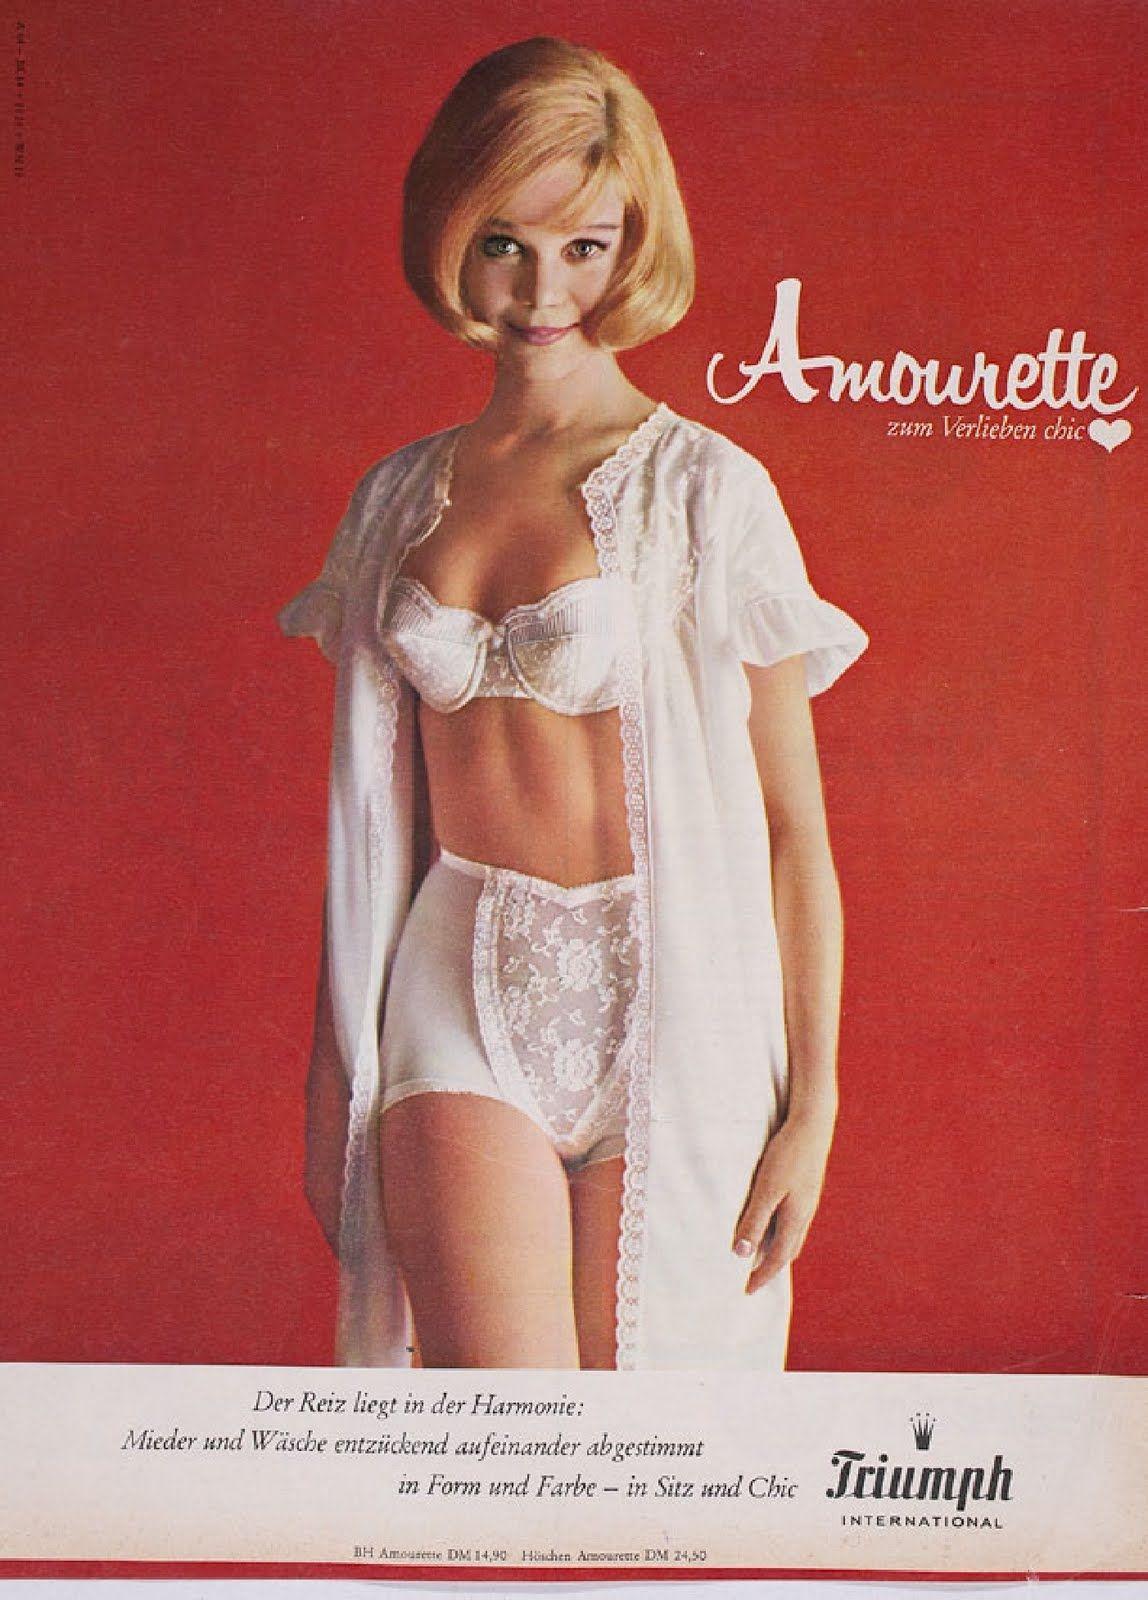 Vintage lingerie adverts